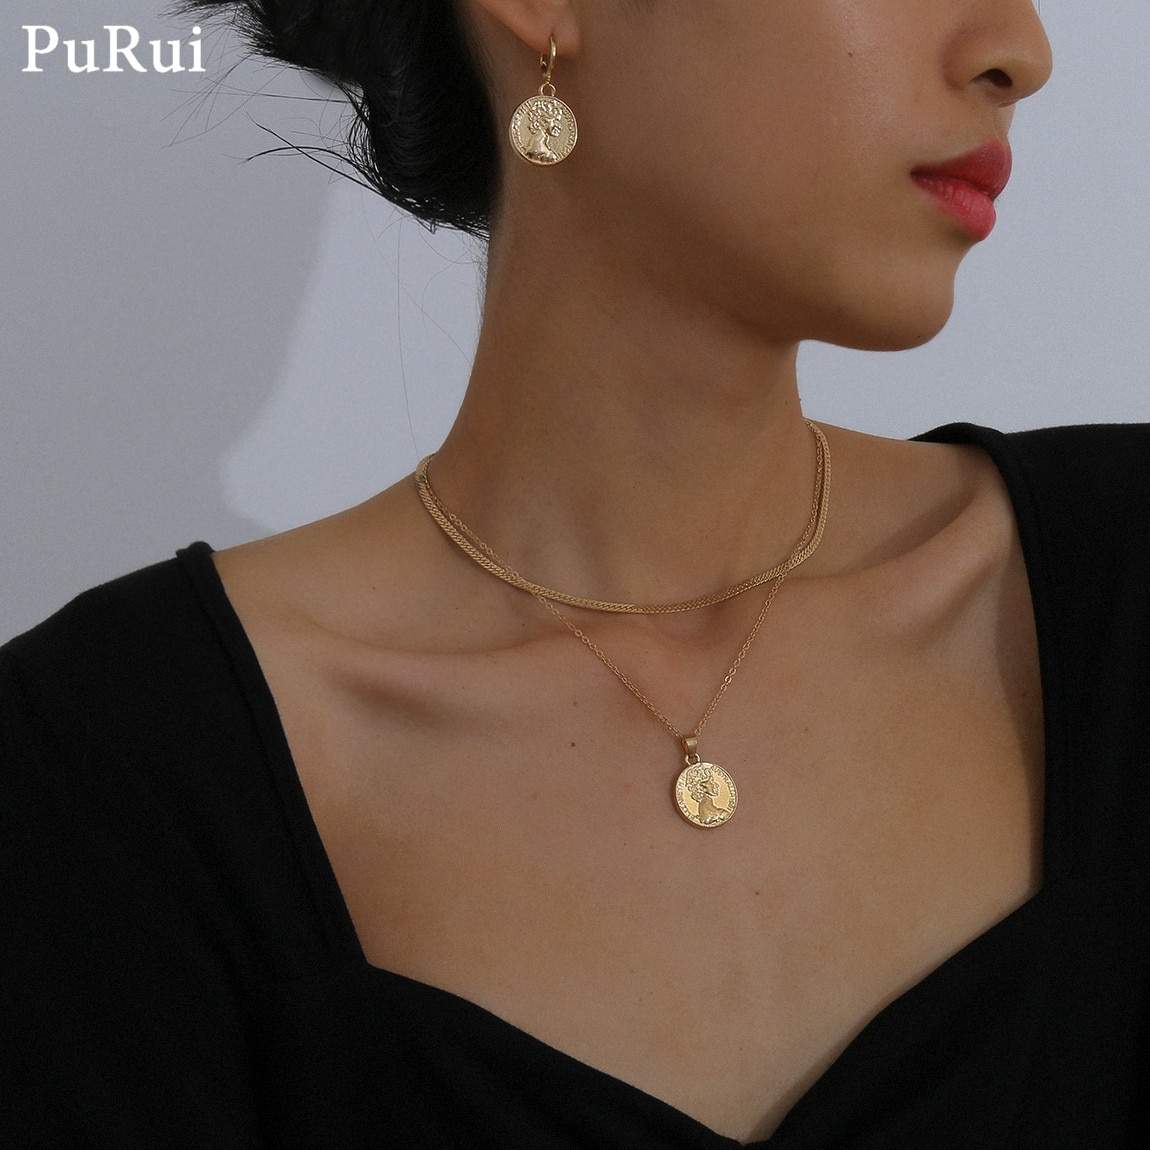 Purui gótico do vintage pingente colar conjunto para mulheres punk cubana link corrente cor ouro gargantilha colar acessórios presente jóias